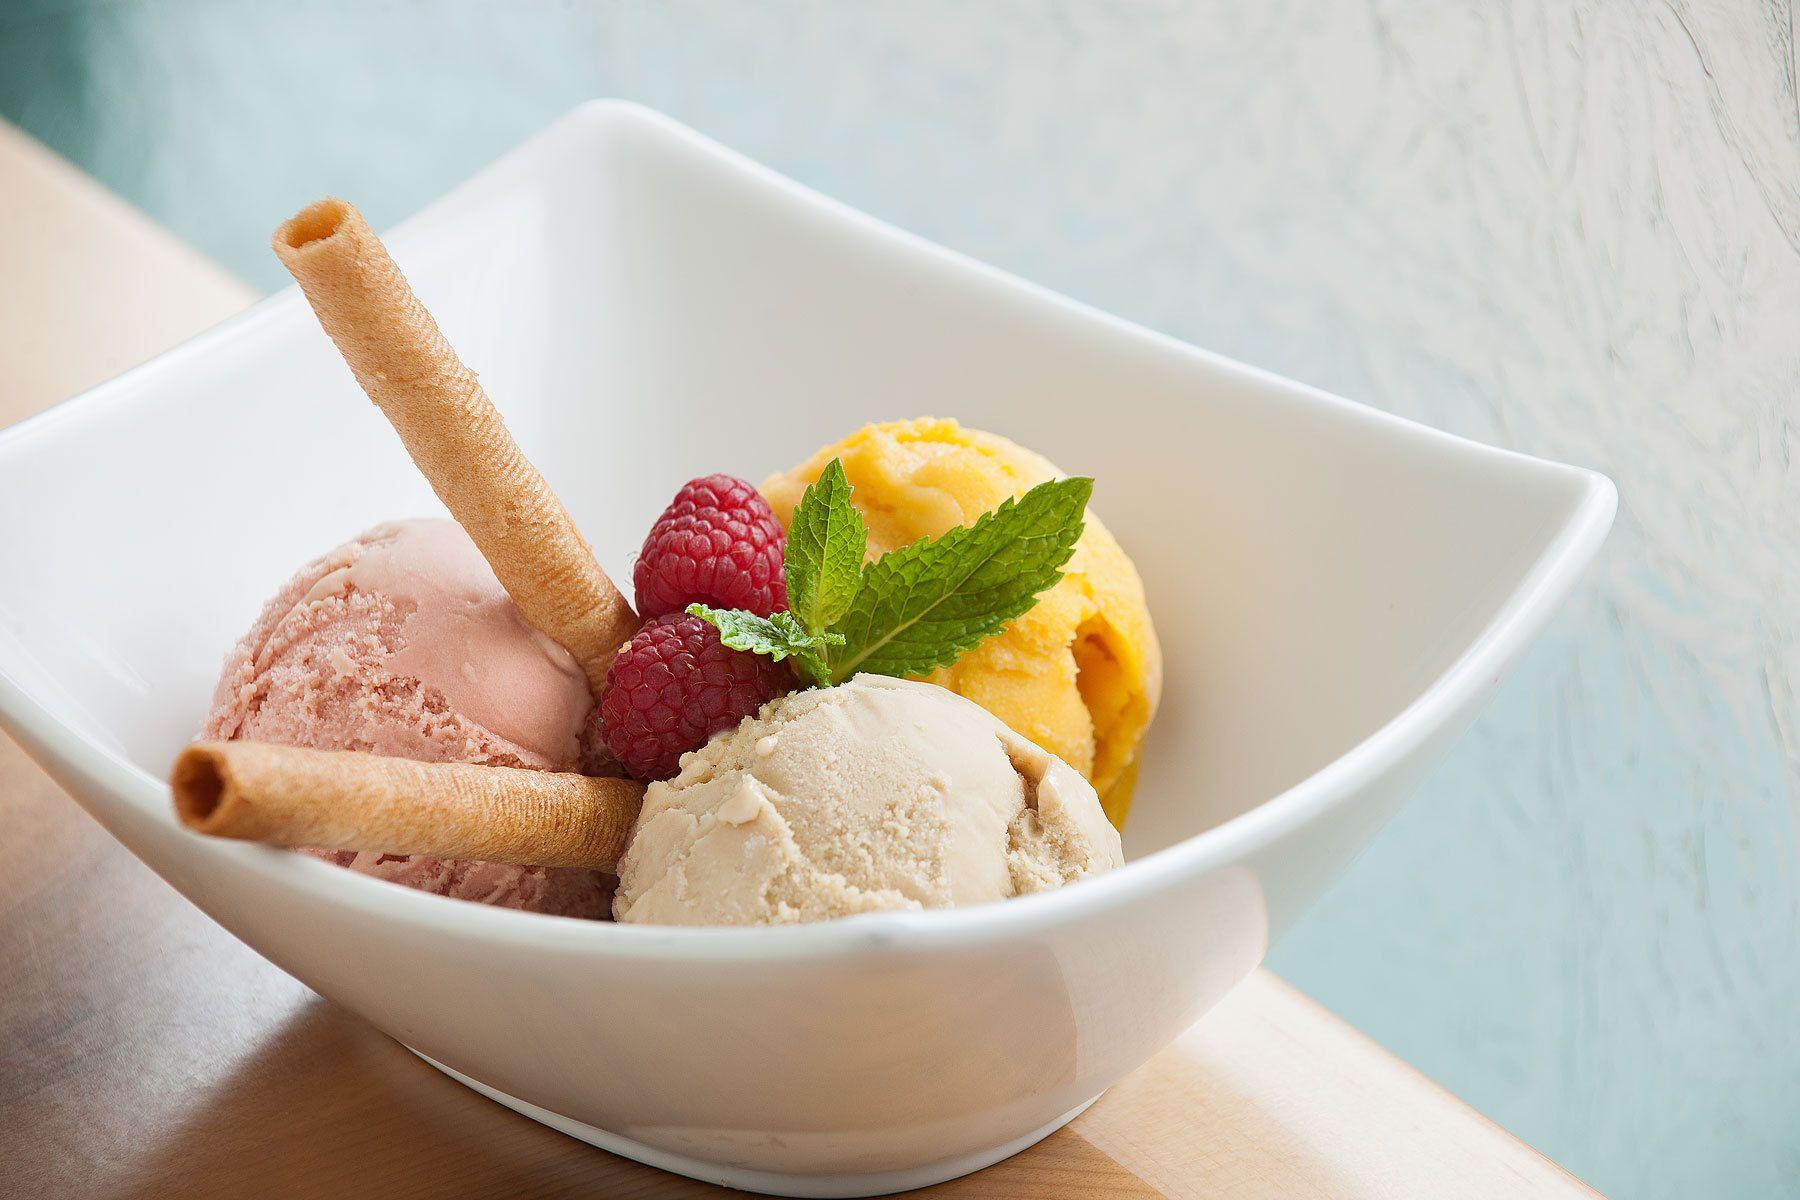 Homemade Ice Cream Trifecta